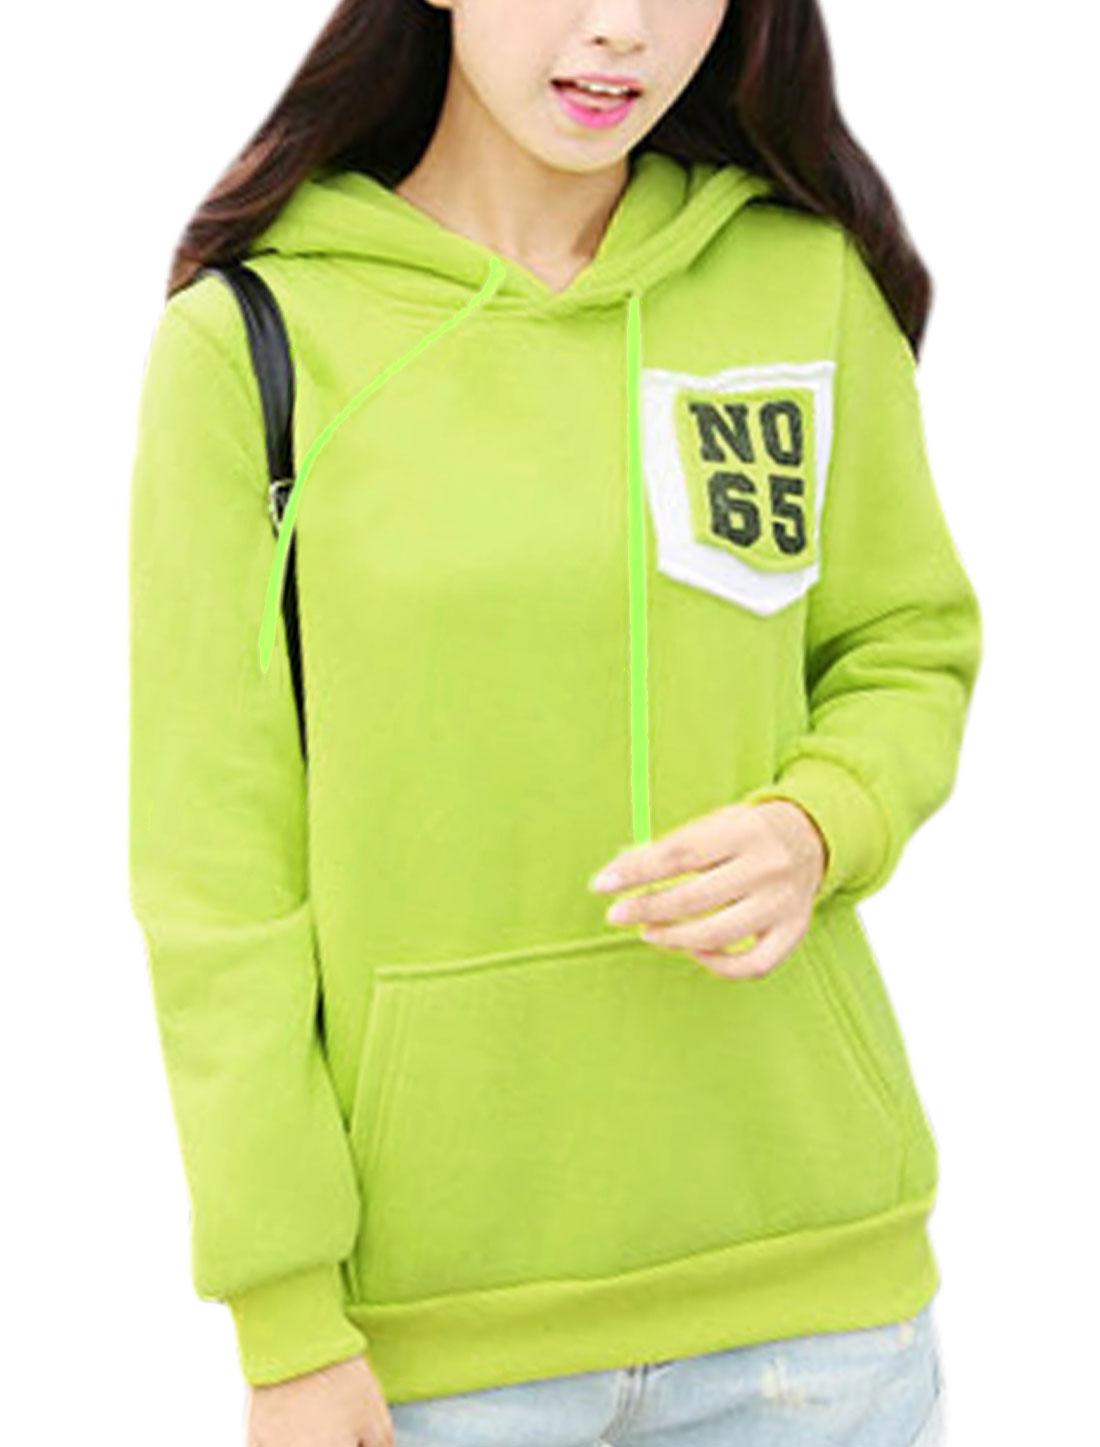 Women Hooded Long Sleeves Kangaroo Pockets Trendy Sweatshirt Green Yellow XS